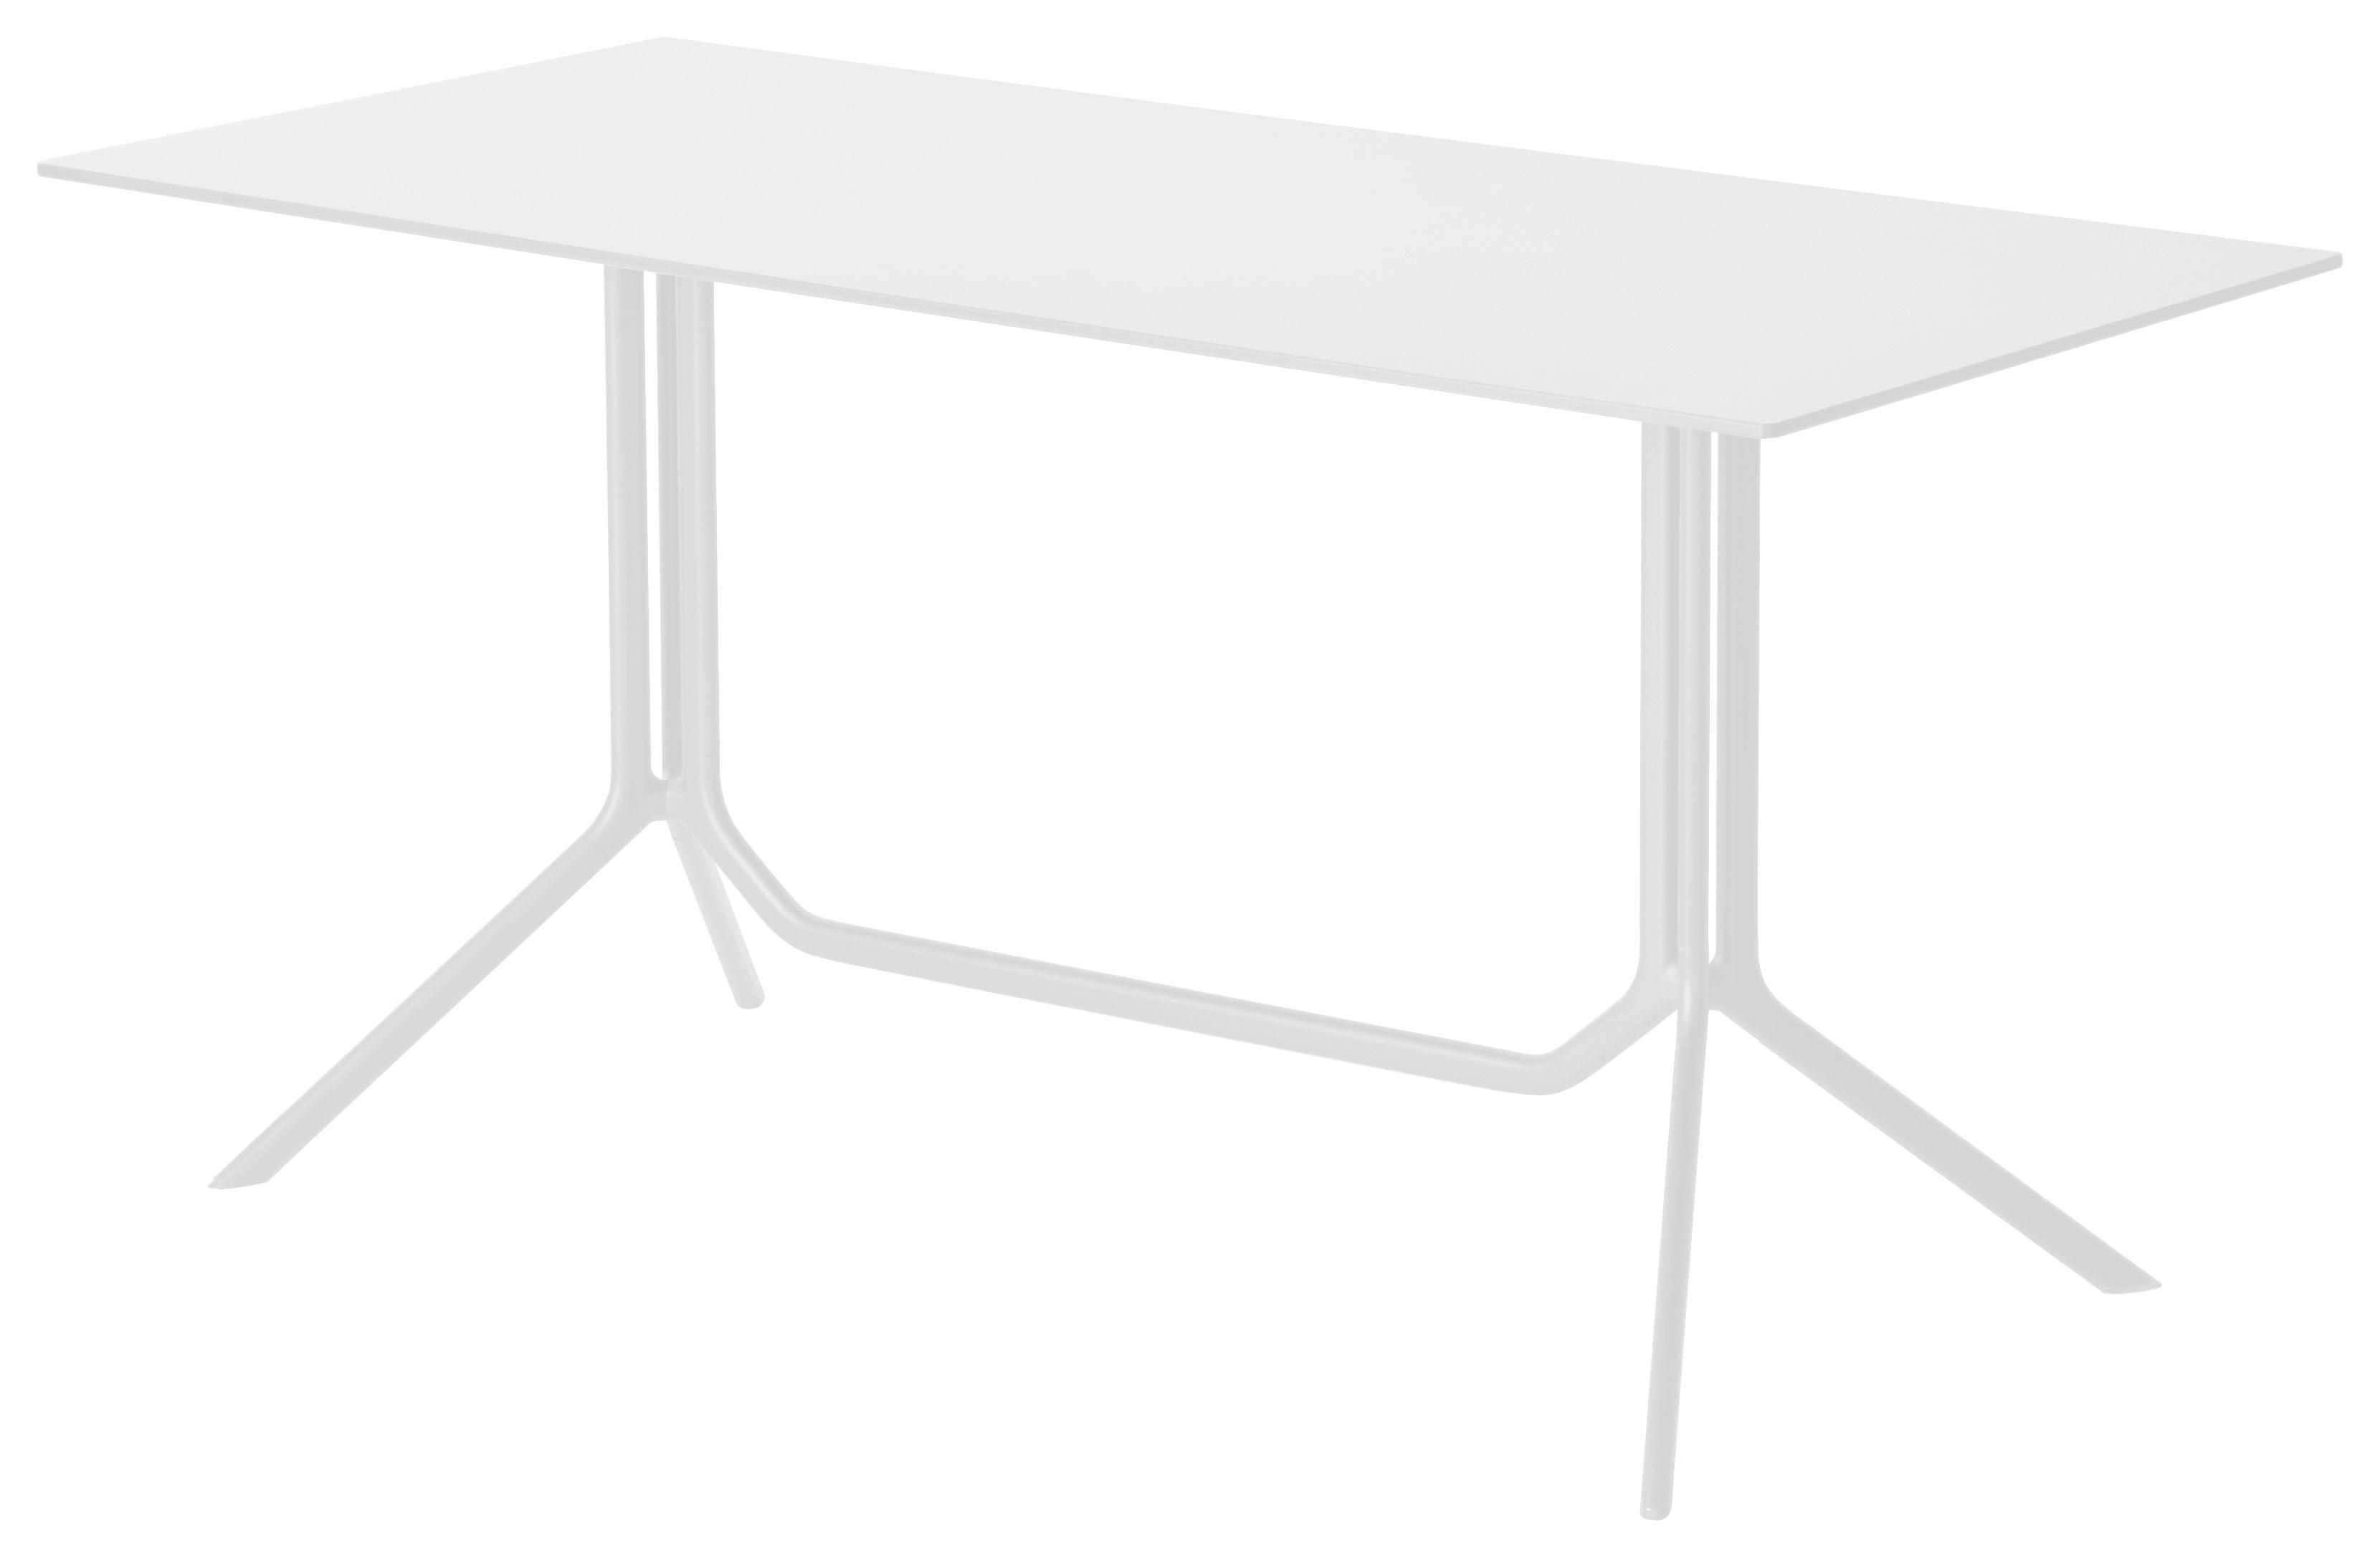 Table pliante poule double 120 x 60 cm lamin blanc - Table pliante 120 x 60 ...